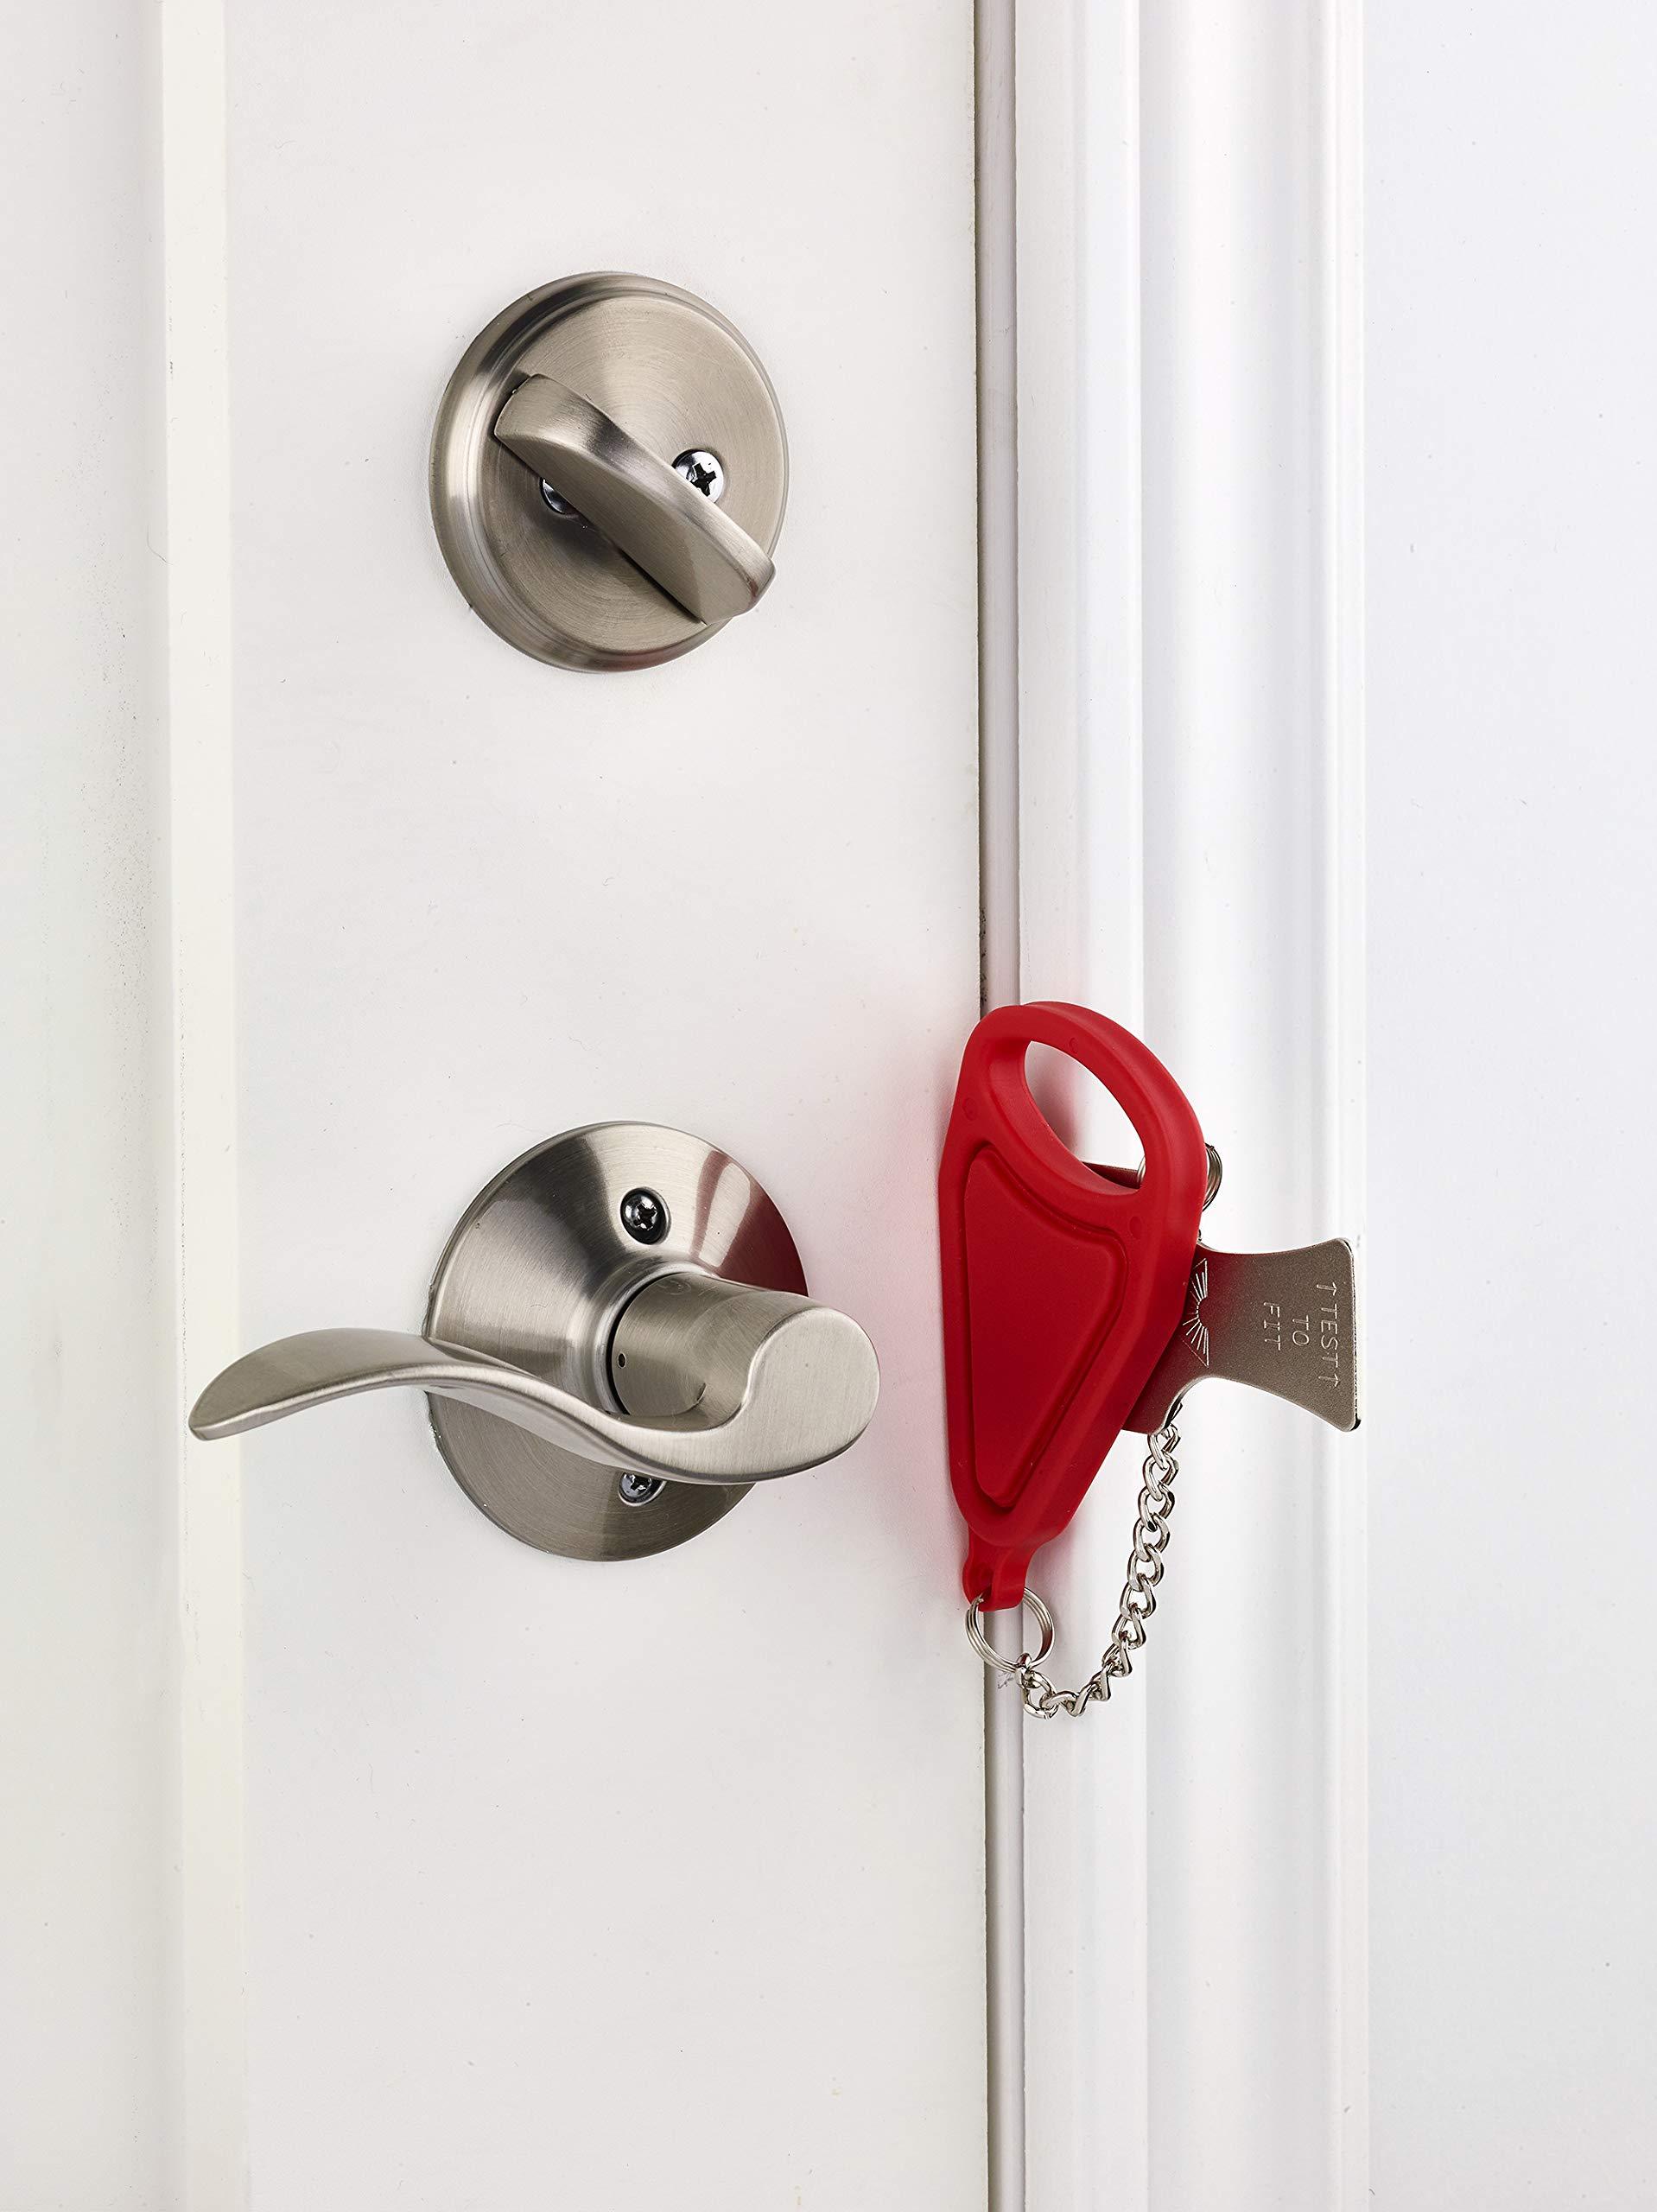 Addalock - (1 Piece) The Original Portable Door Lock, Travel Lock, AirBNB Lock, School Lockdown Lock. PLEASE NOTE: The Genuine Addalock is exclusively sold worldwide only by Rishon Enterprises Inc. by Addalock